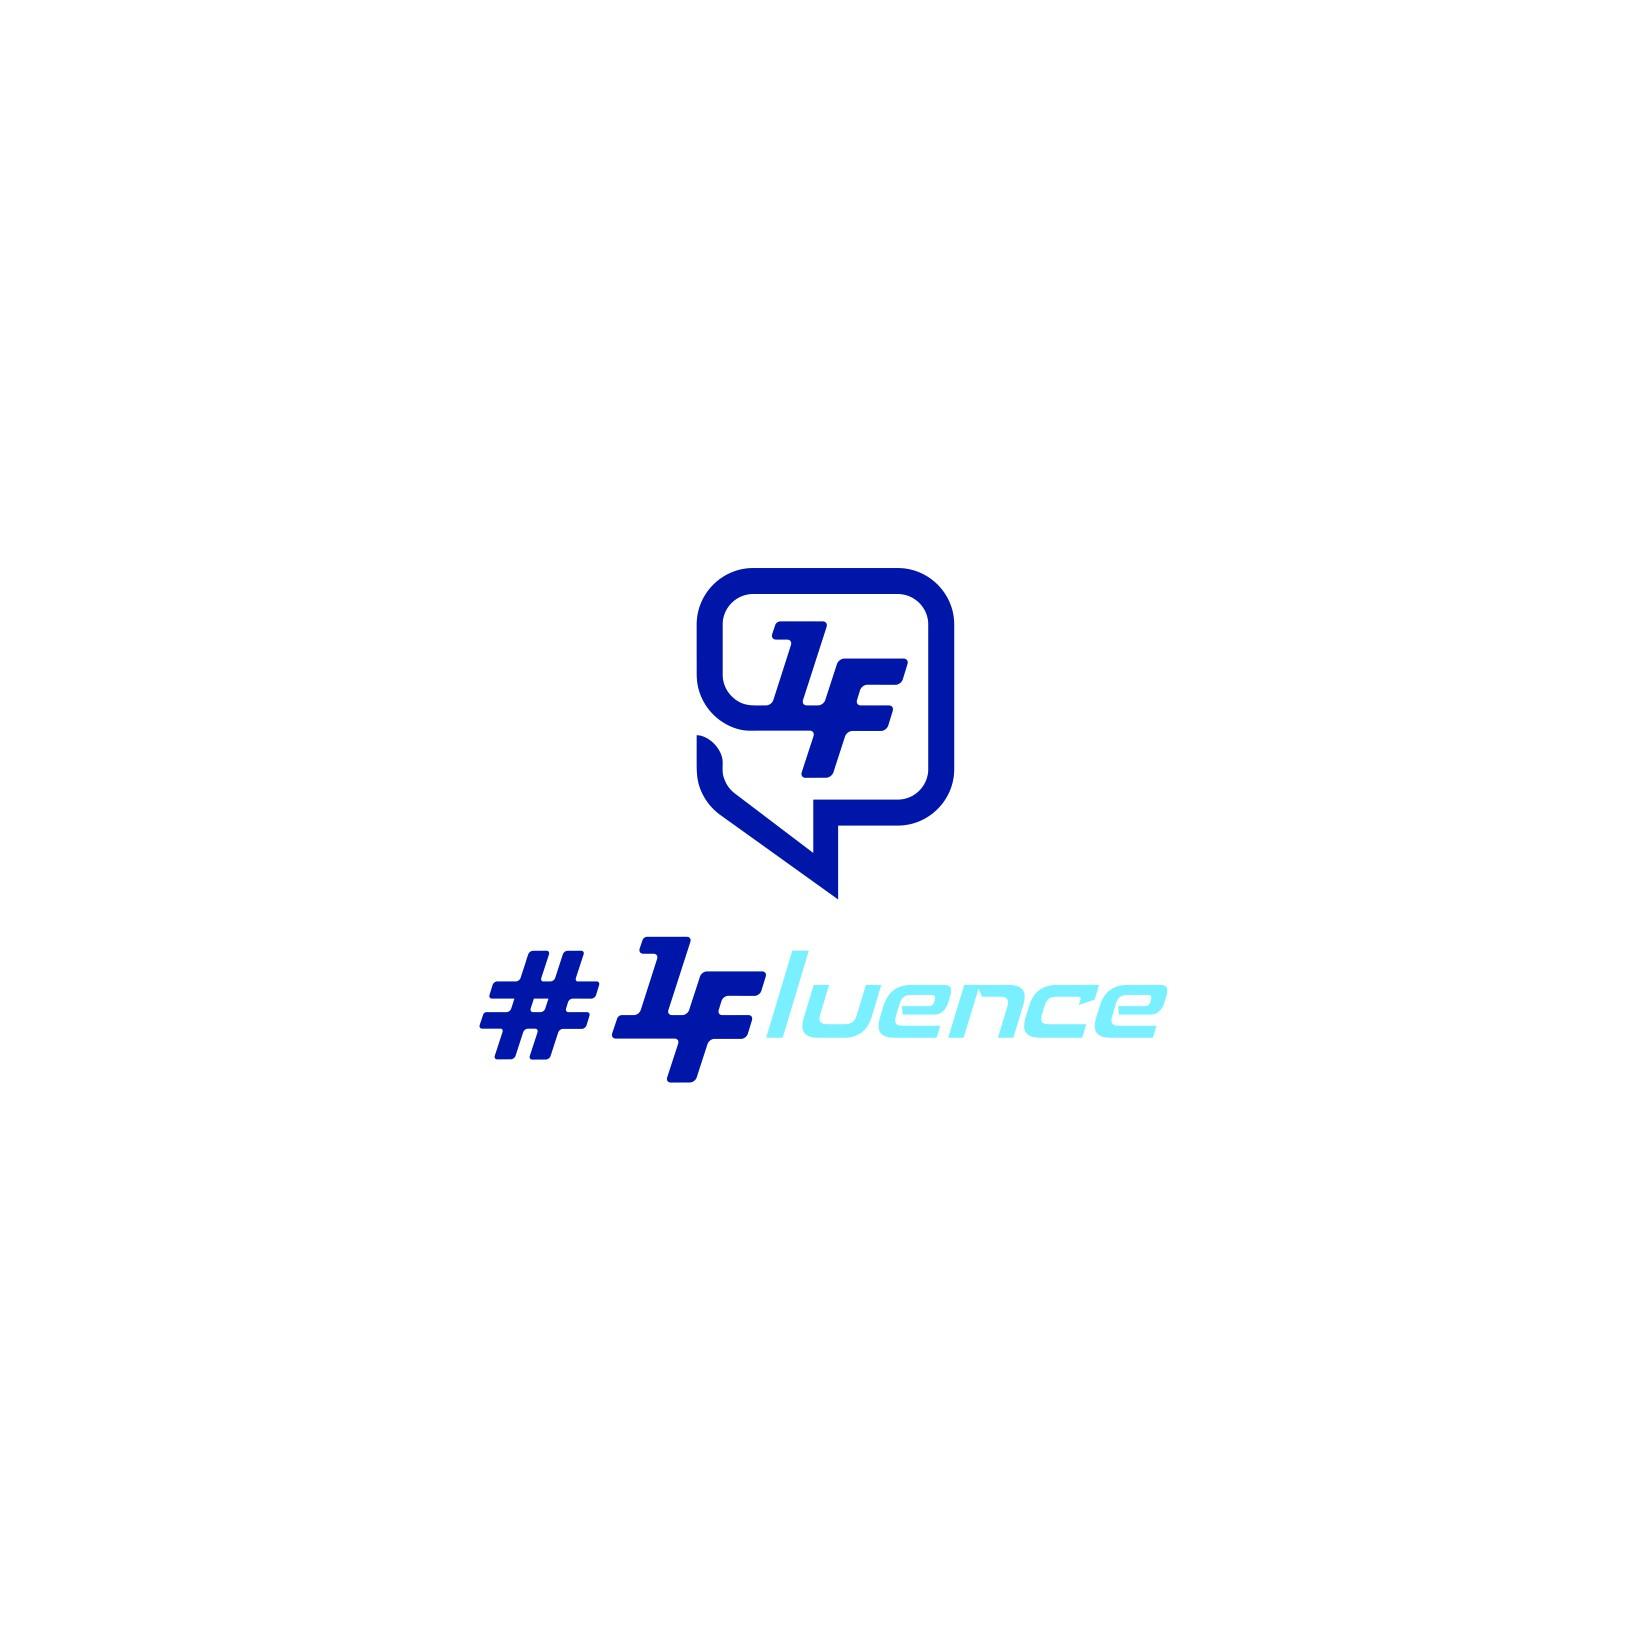 Help create the image of 1Fluence.